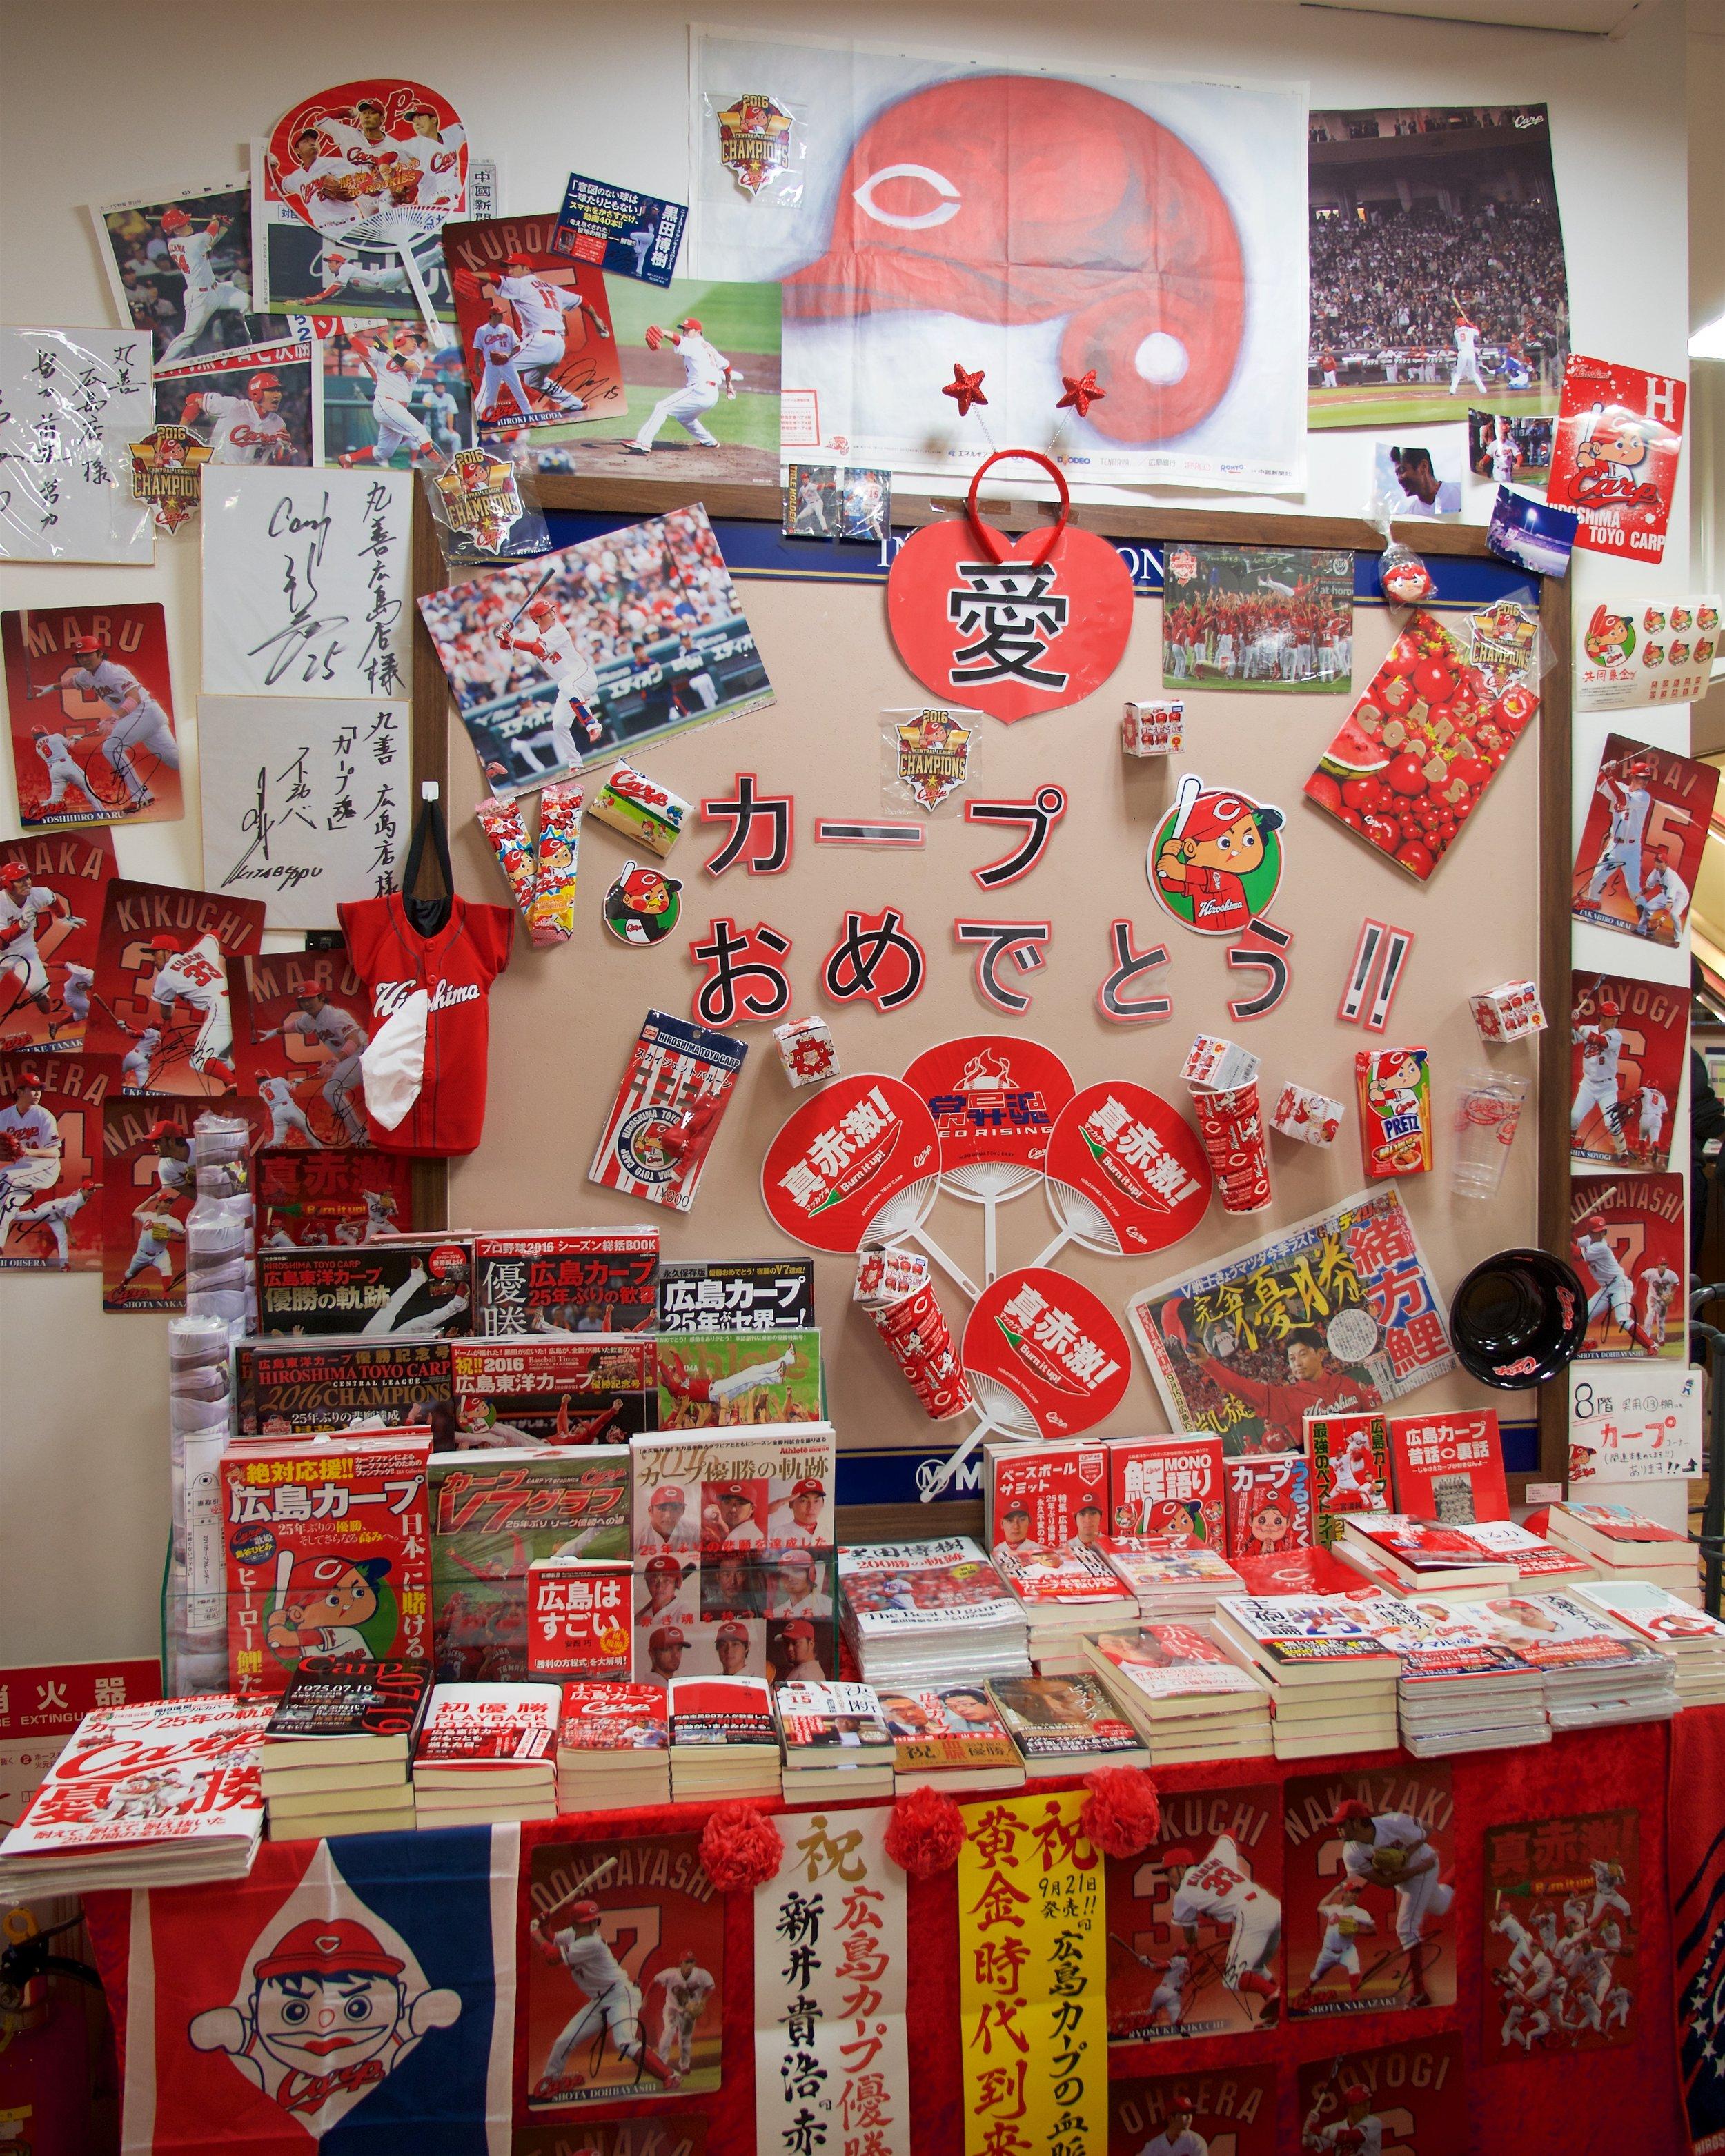 Hiroshima Carp display at Maruzen Bookstore